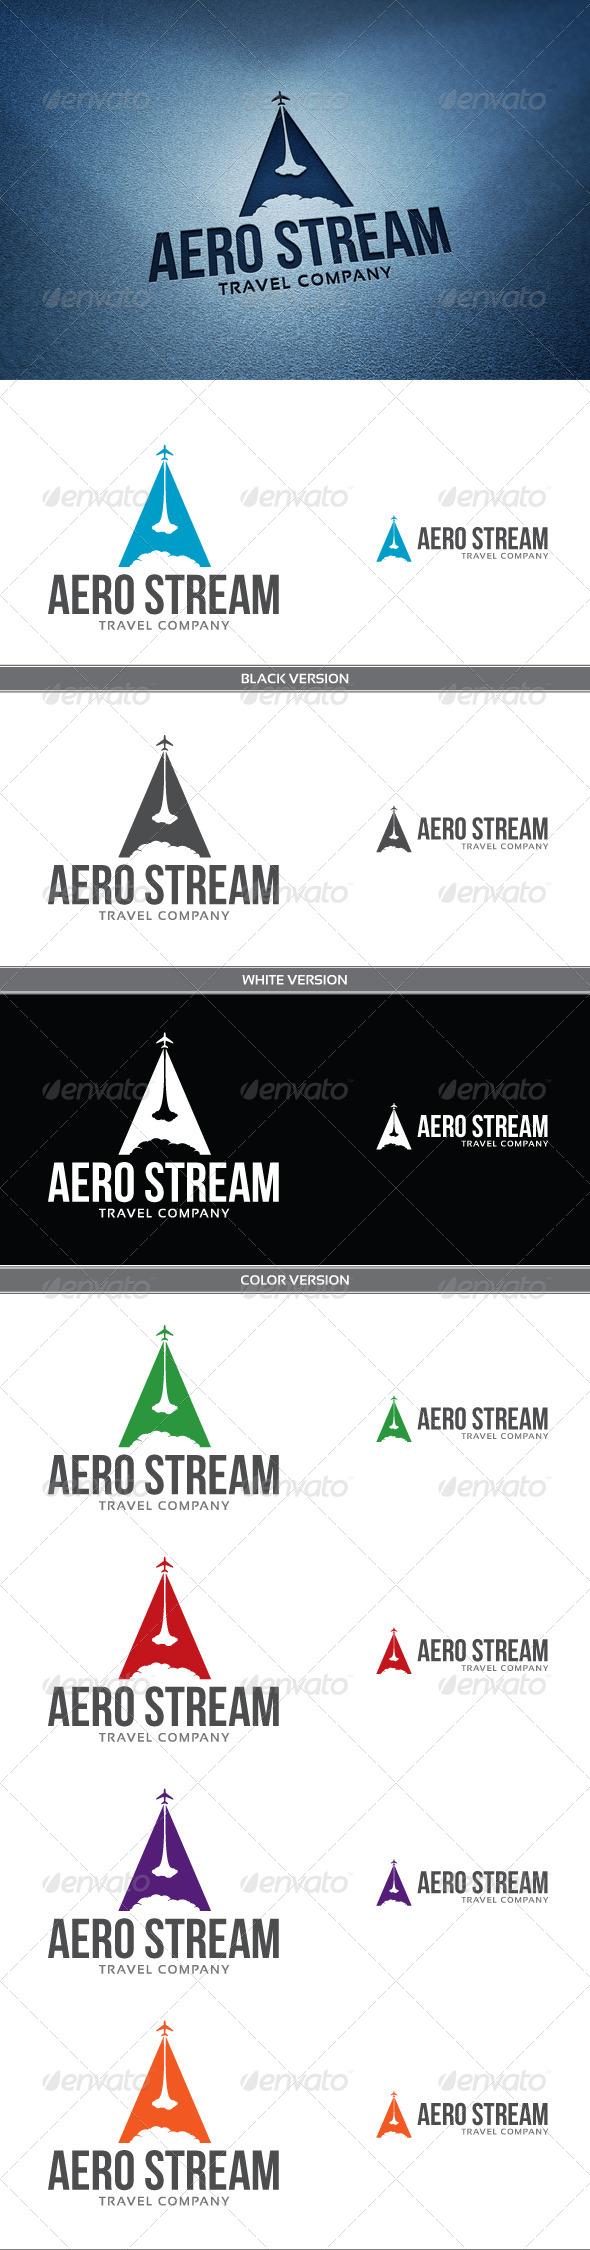 Aero Stream - Letters Logo Templates